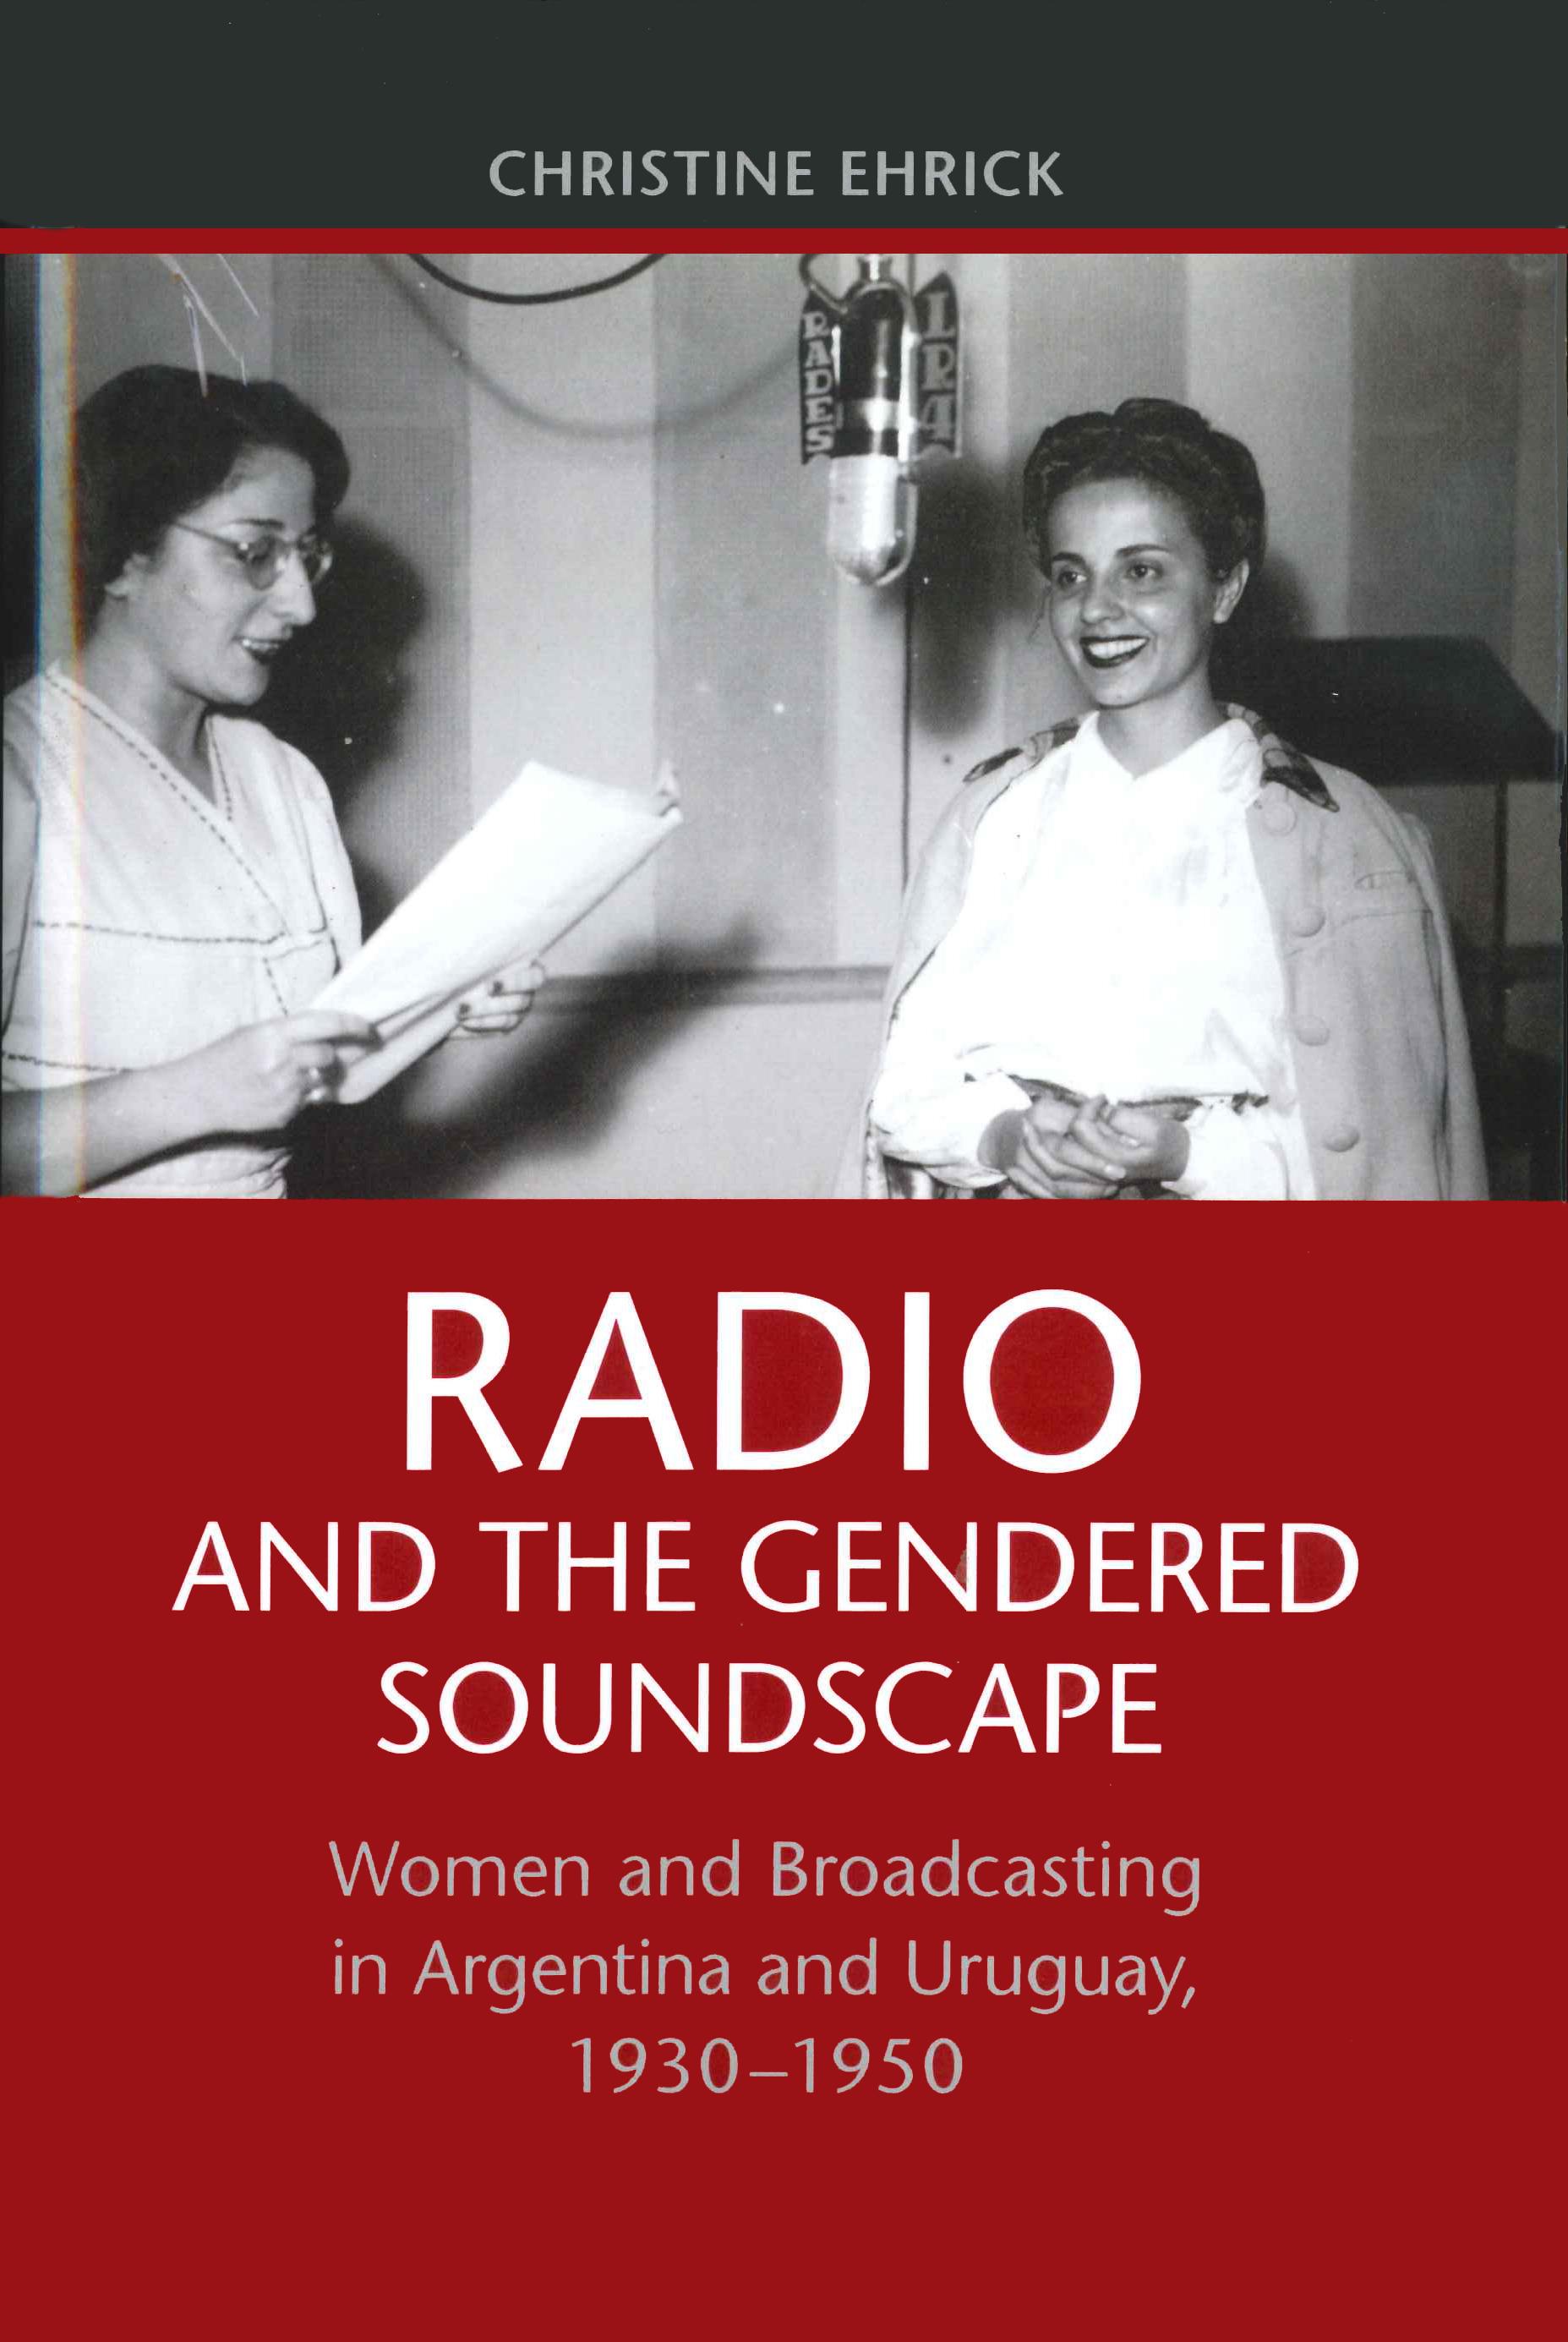 radioandthegenderedsoundscape